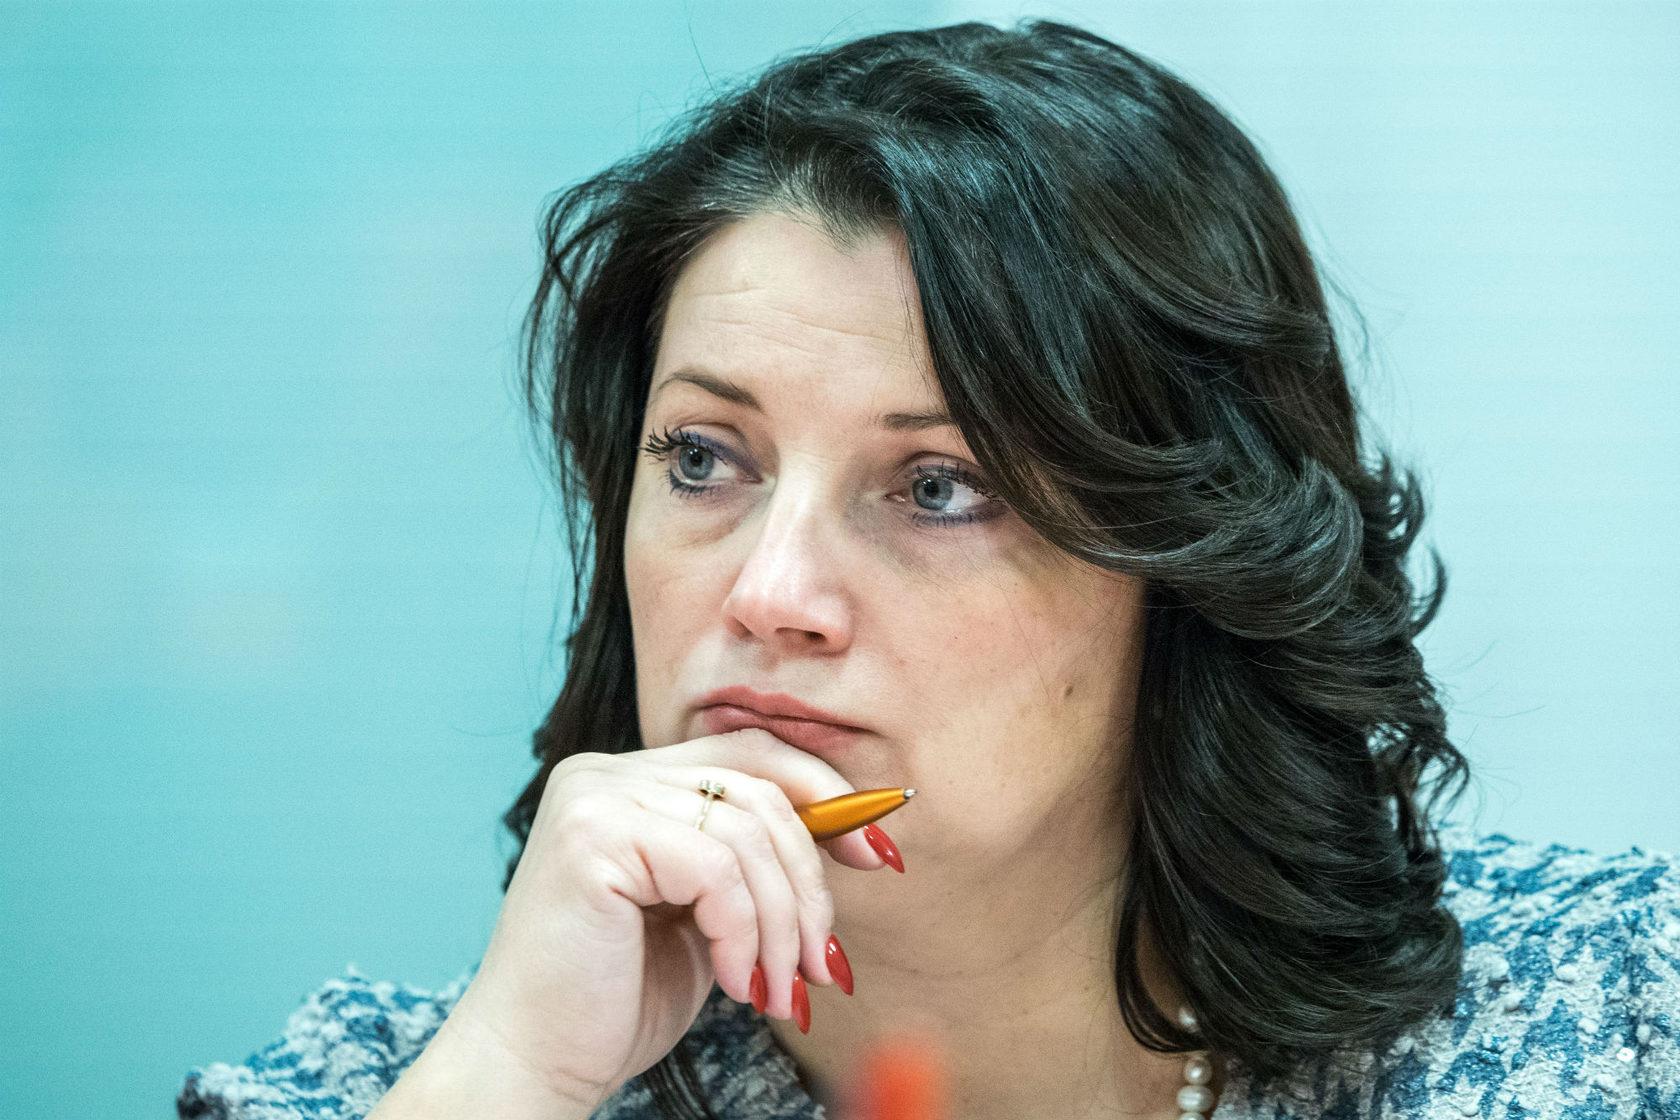 Депутат ЗакСобрания Санкт-Петербурга Надежда Тихонова: